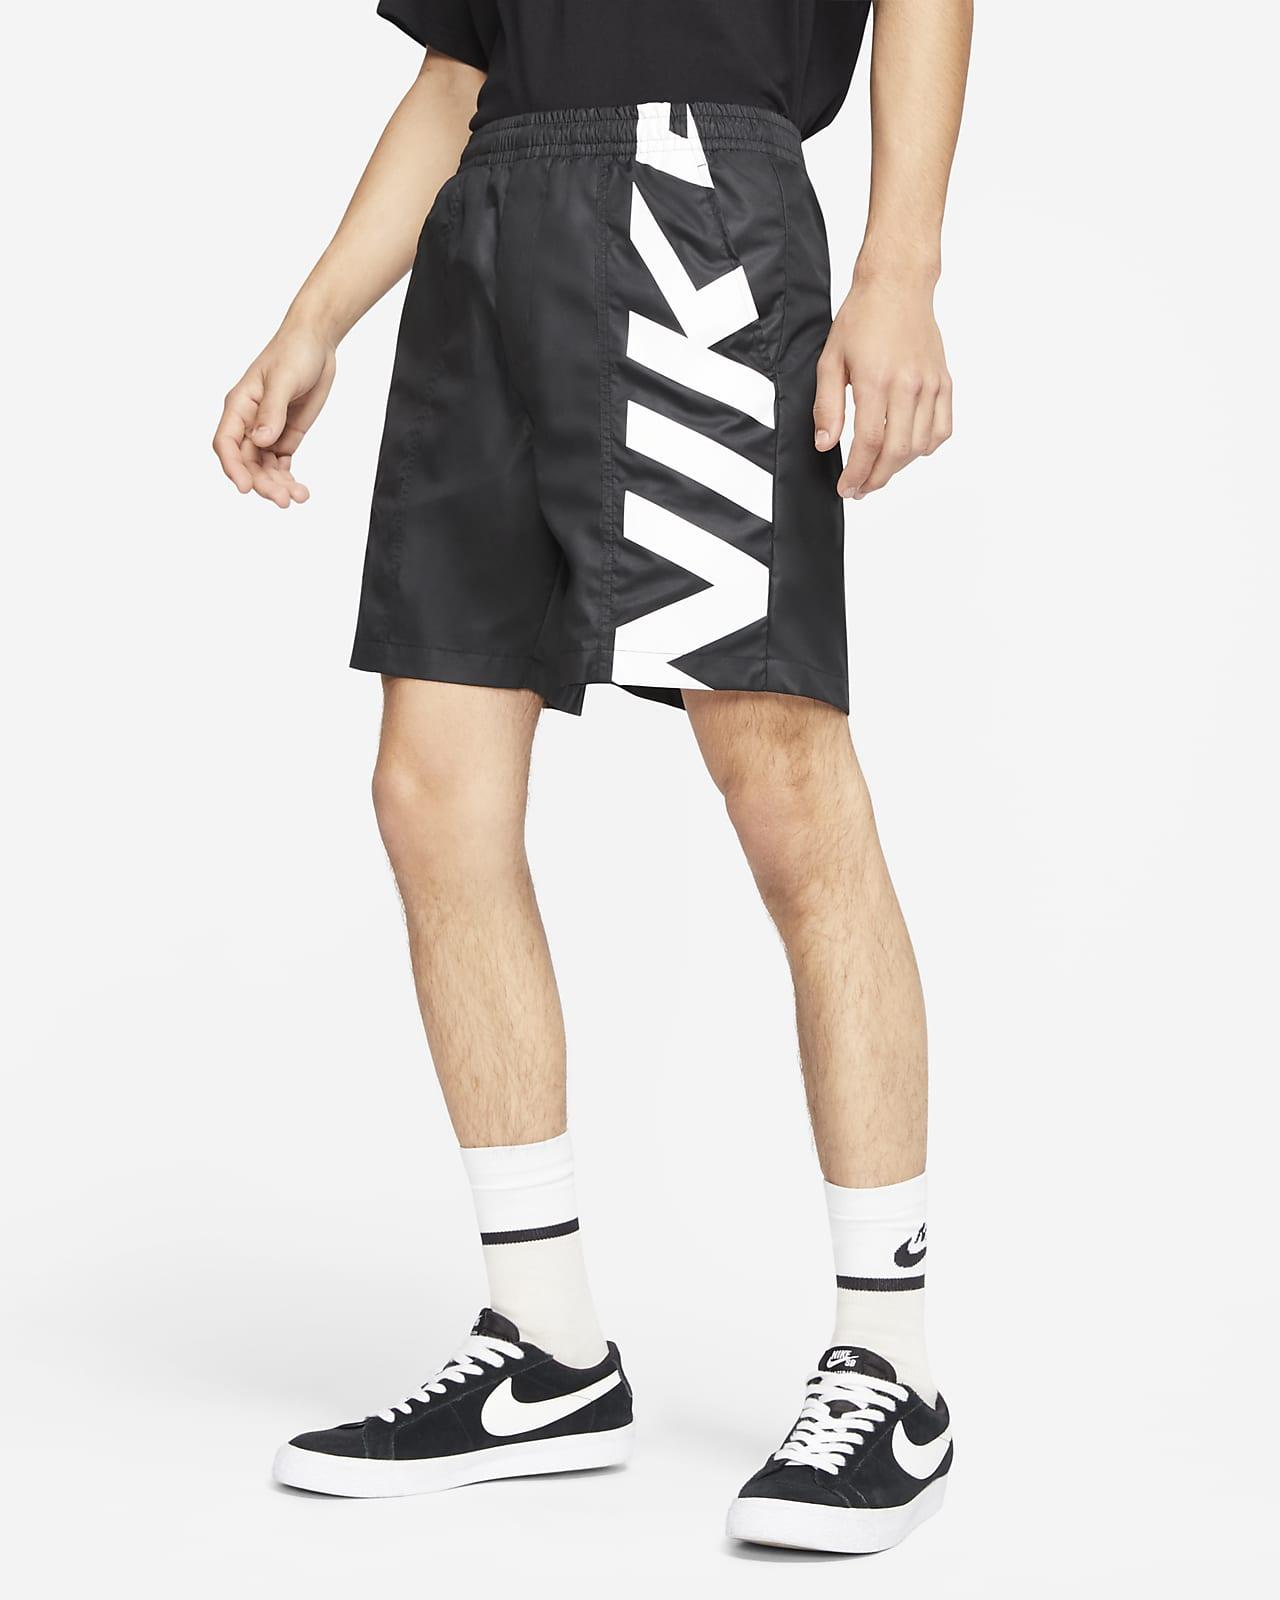 Nike SB Men's Skate Shorts. Nike NL